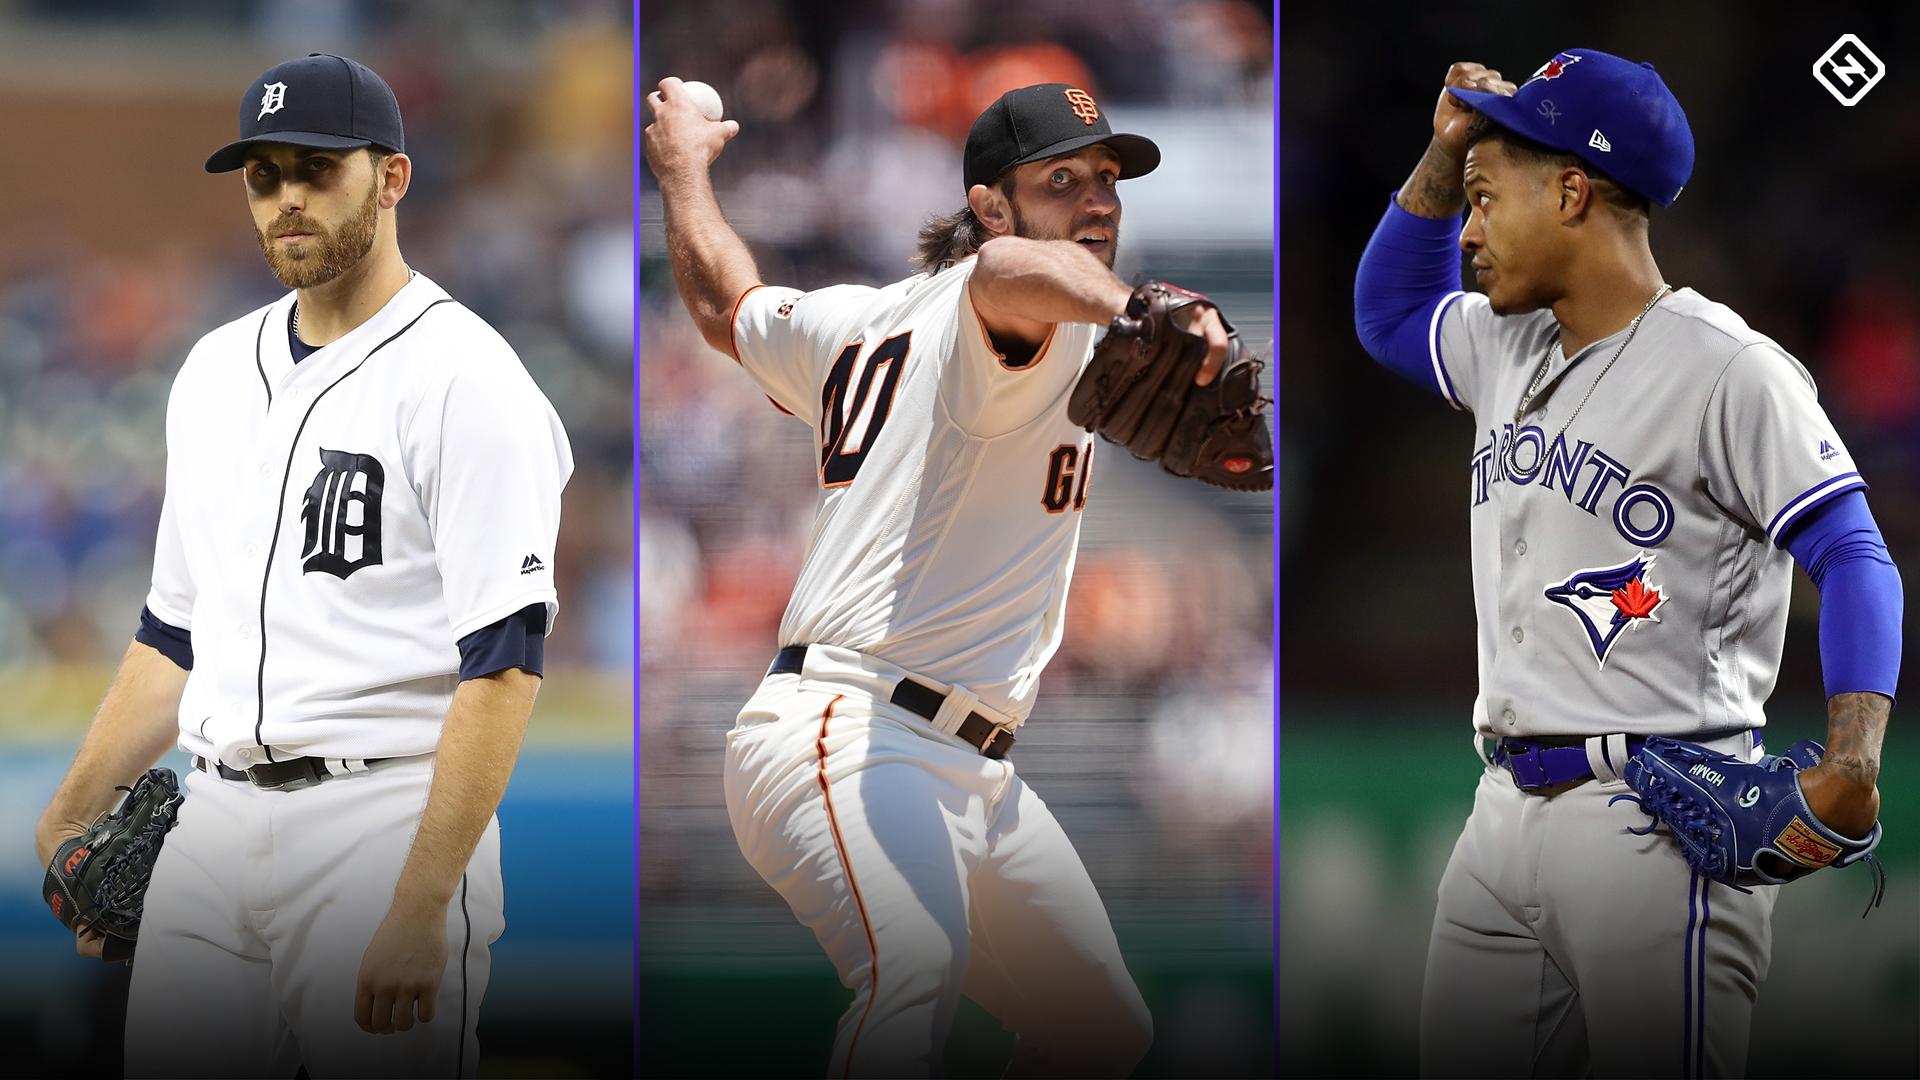 MLB trade deadline 2019: Date, rumors, top targets, new rules for Hot Stove season